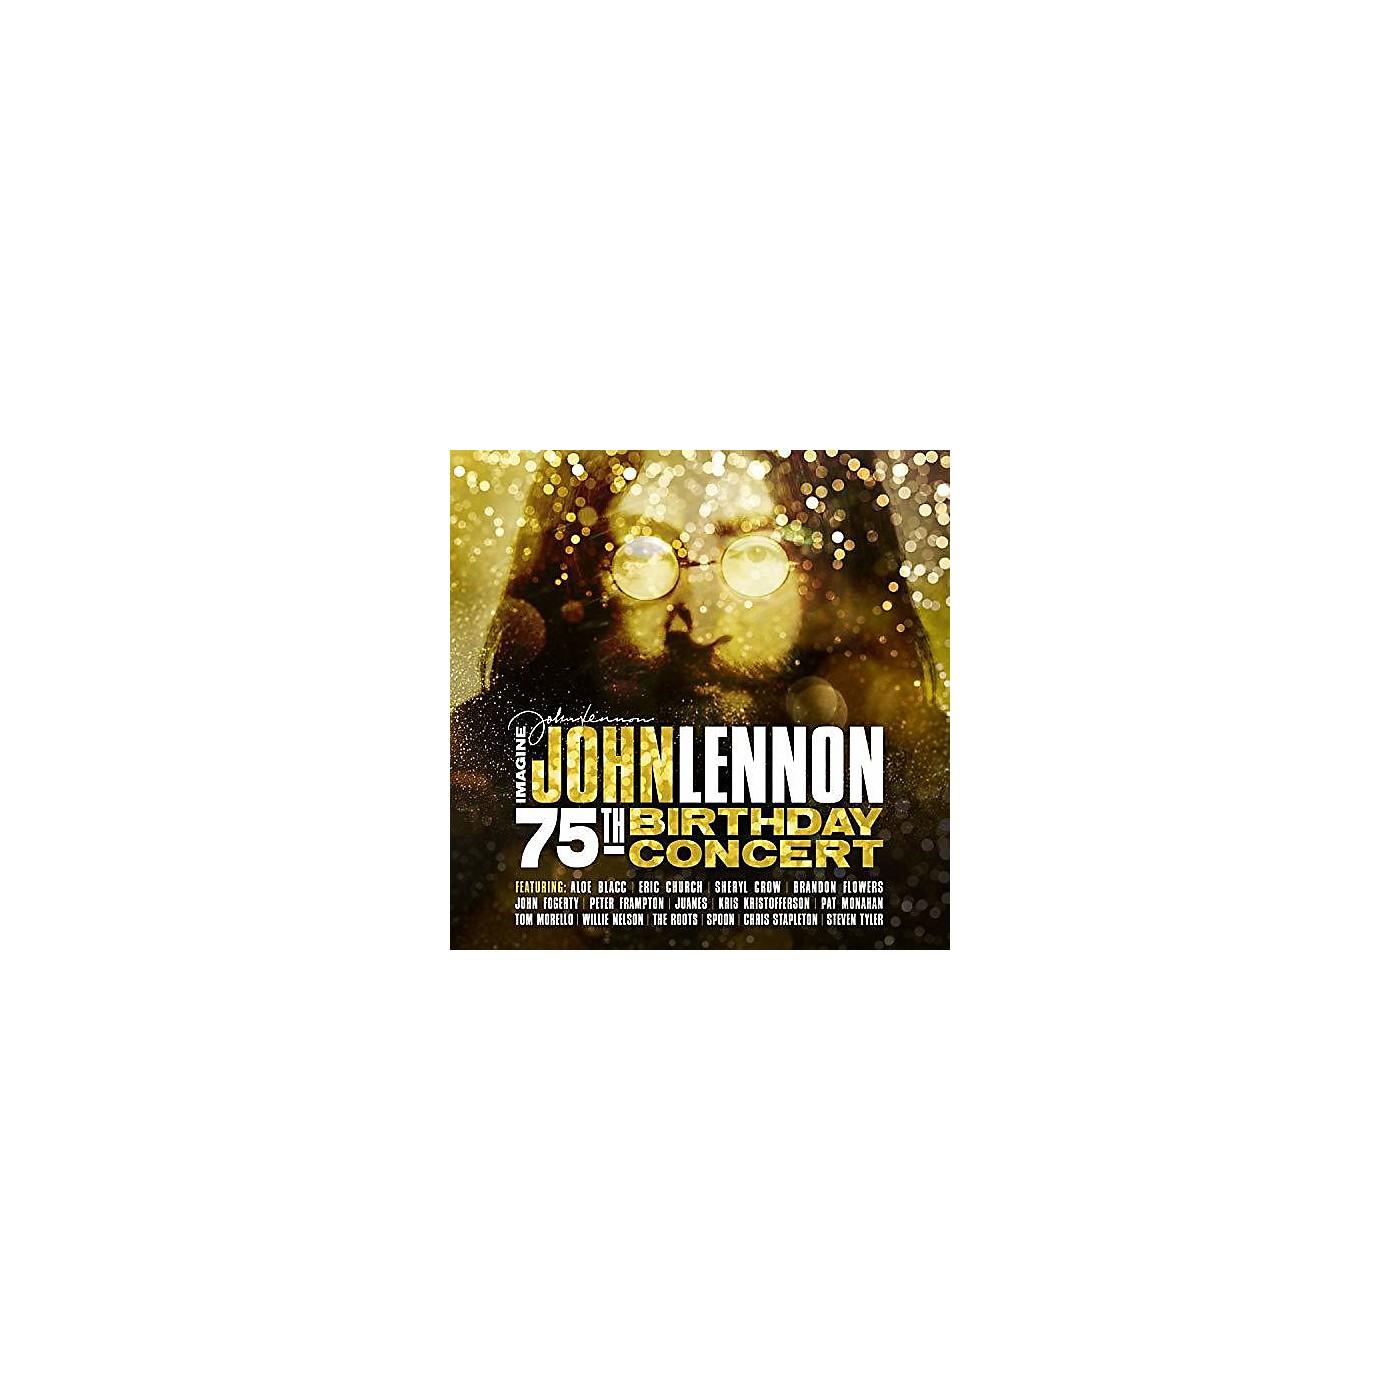 Alliance Various Artists - Imagine: John Lennon 75th Birthday Concert (Various Artists) (CD) thumbnail